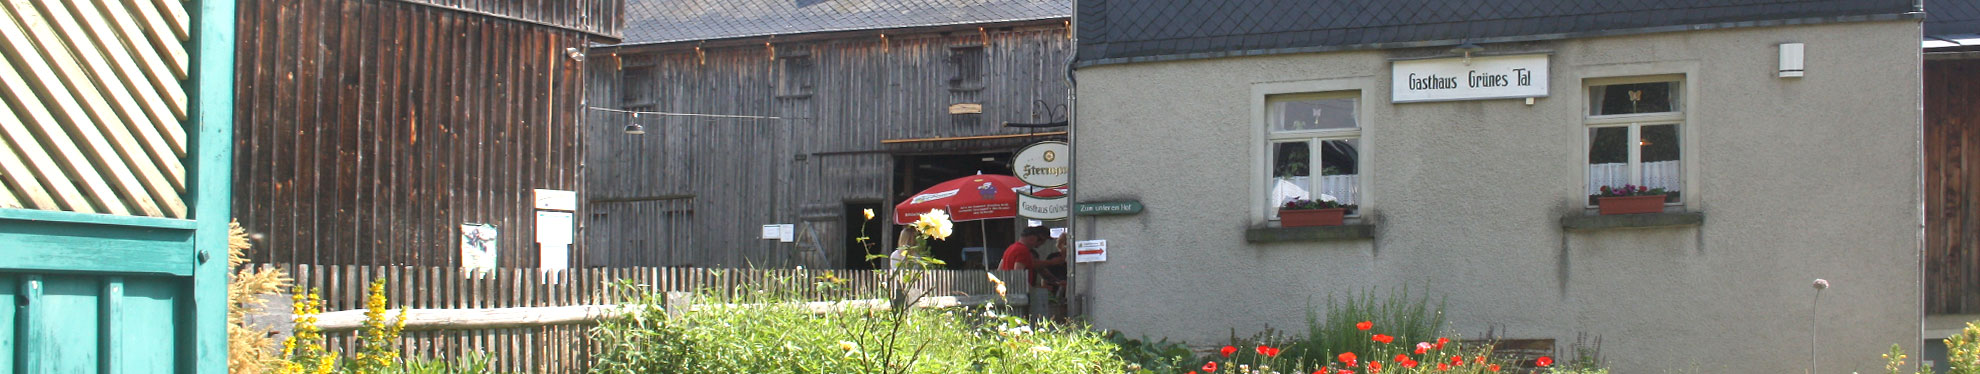 Eubabrunn Museumshof